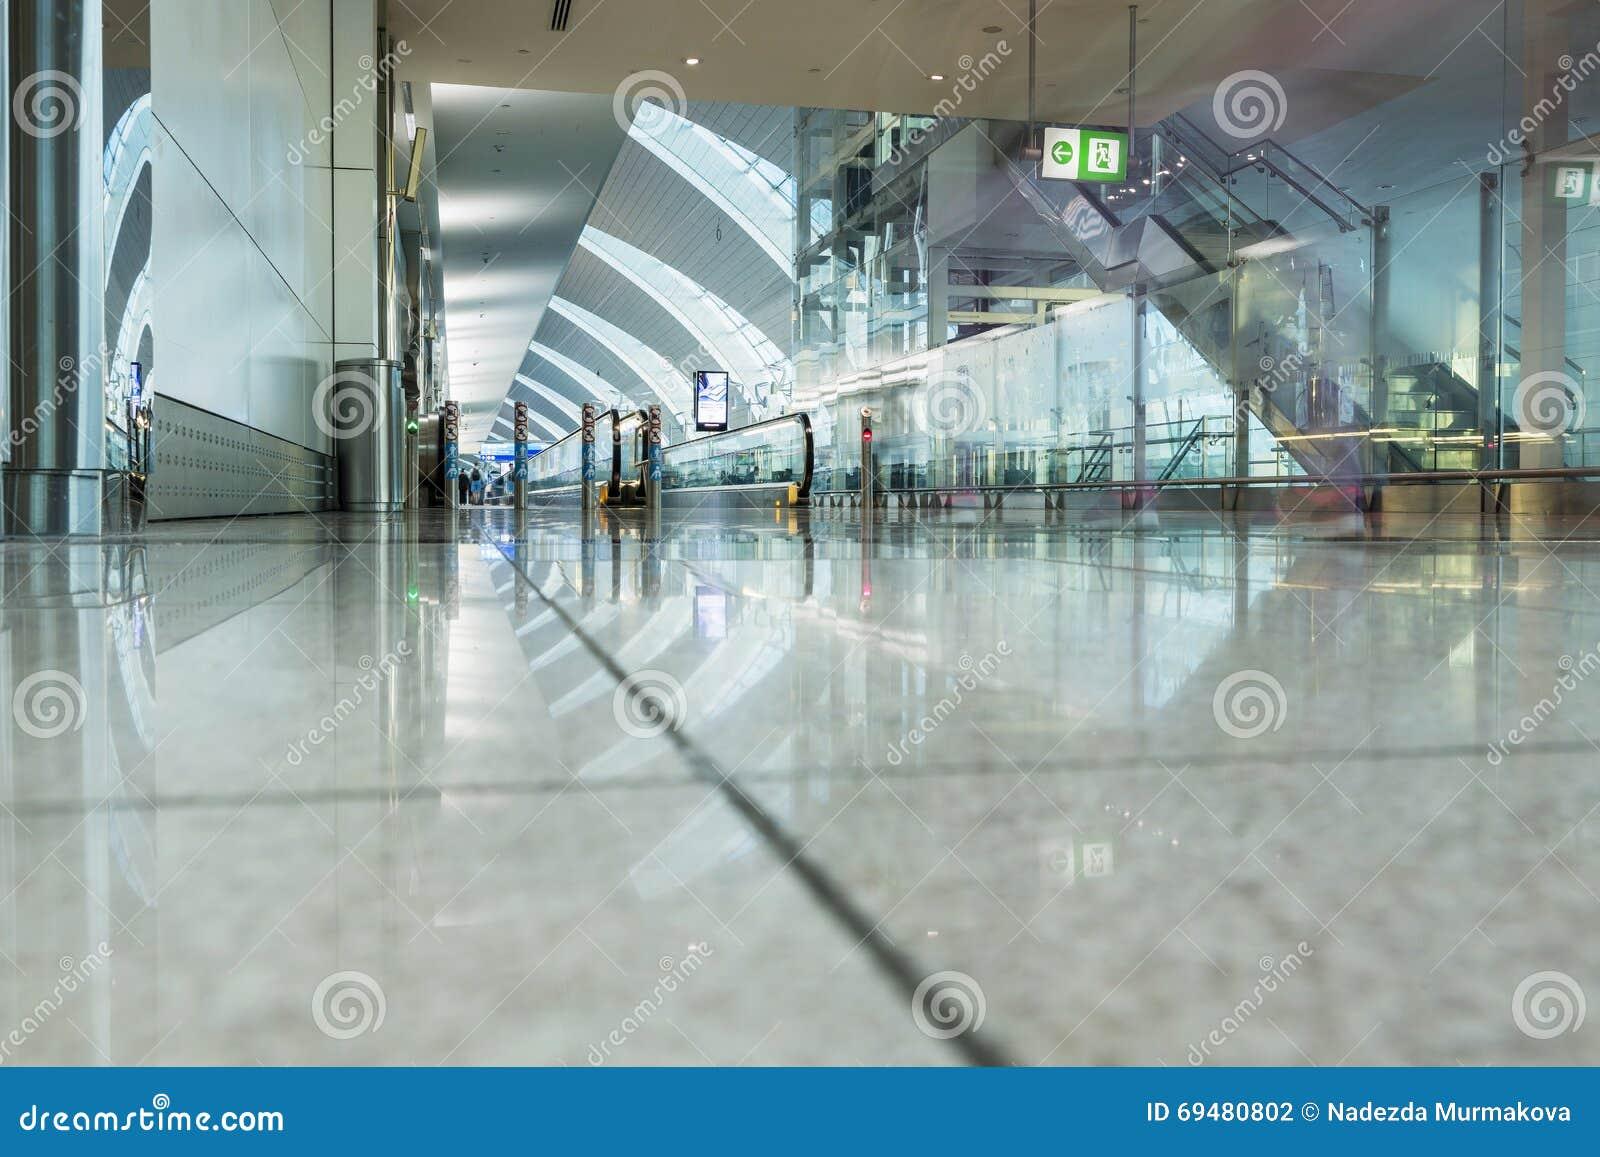 DOUBAI - APRIL 06: Passagiershal in Dubai International-Luchthaven